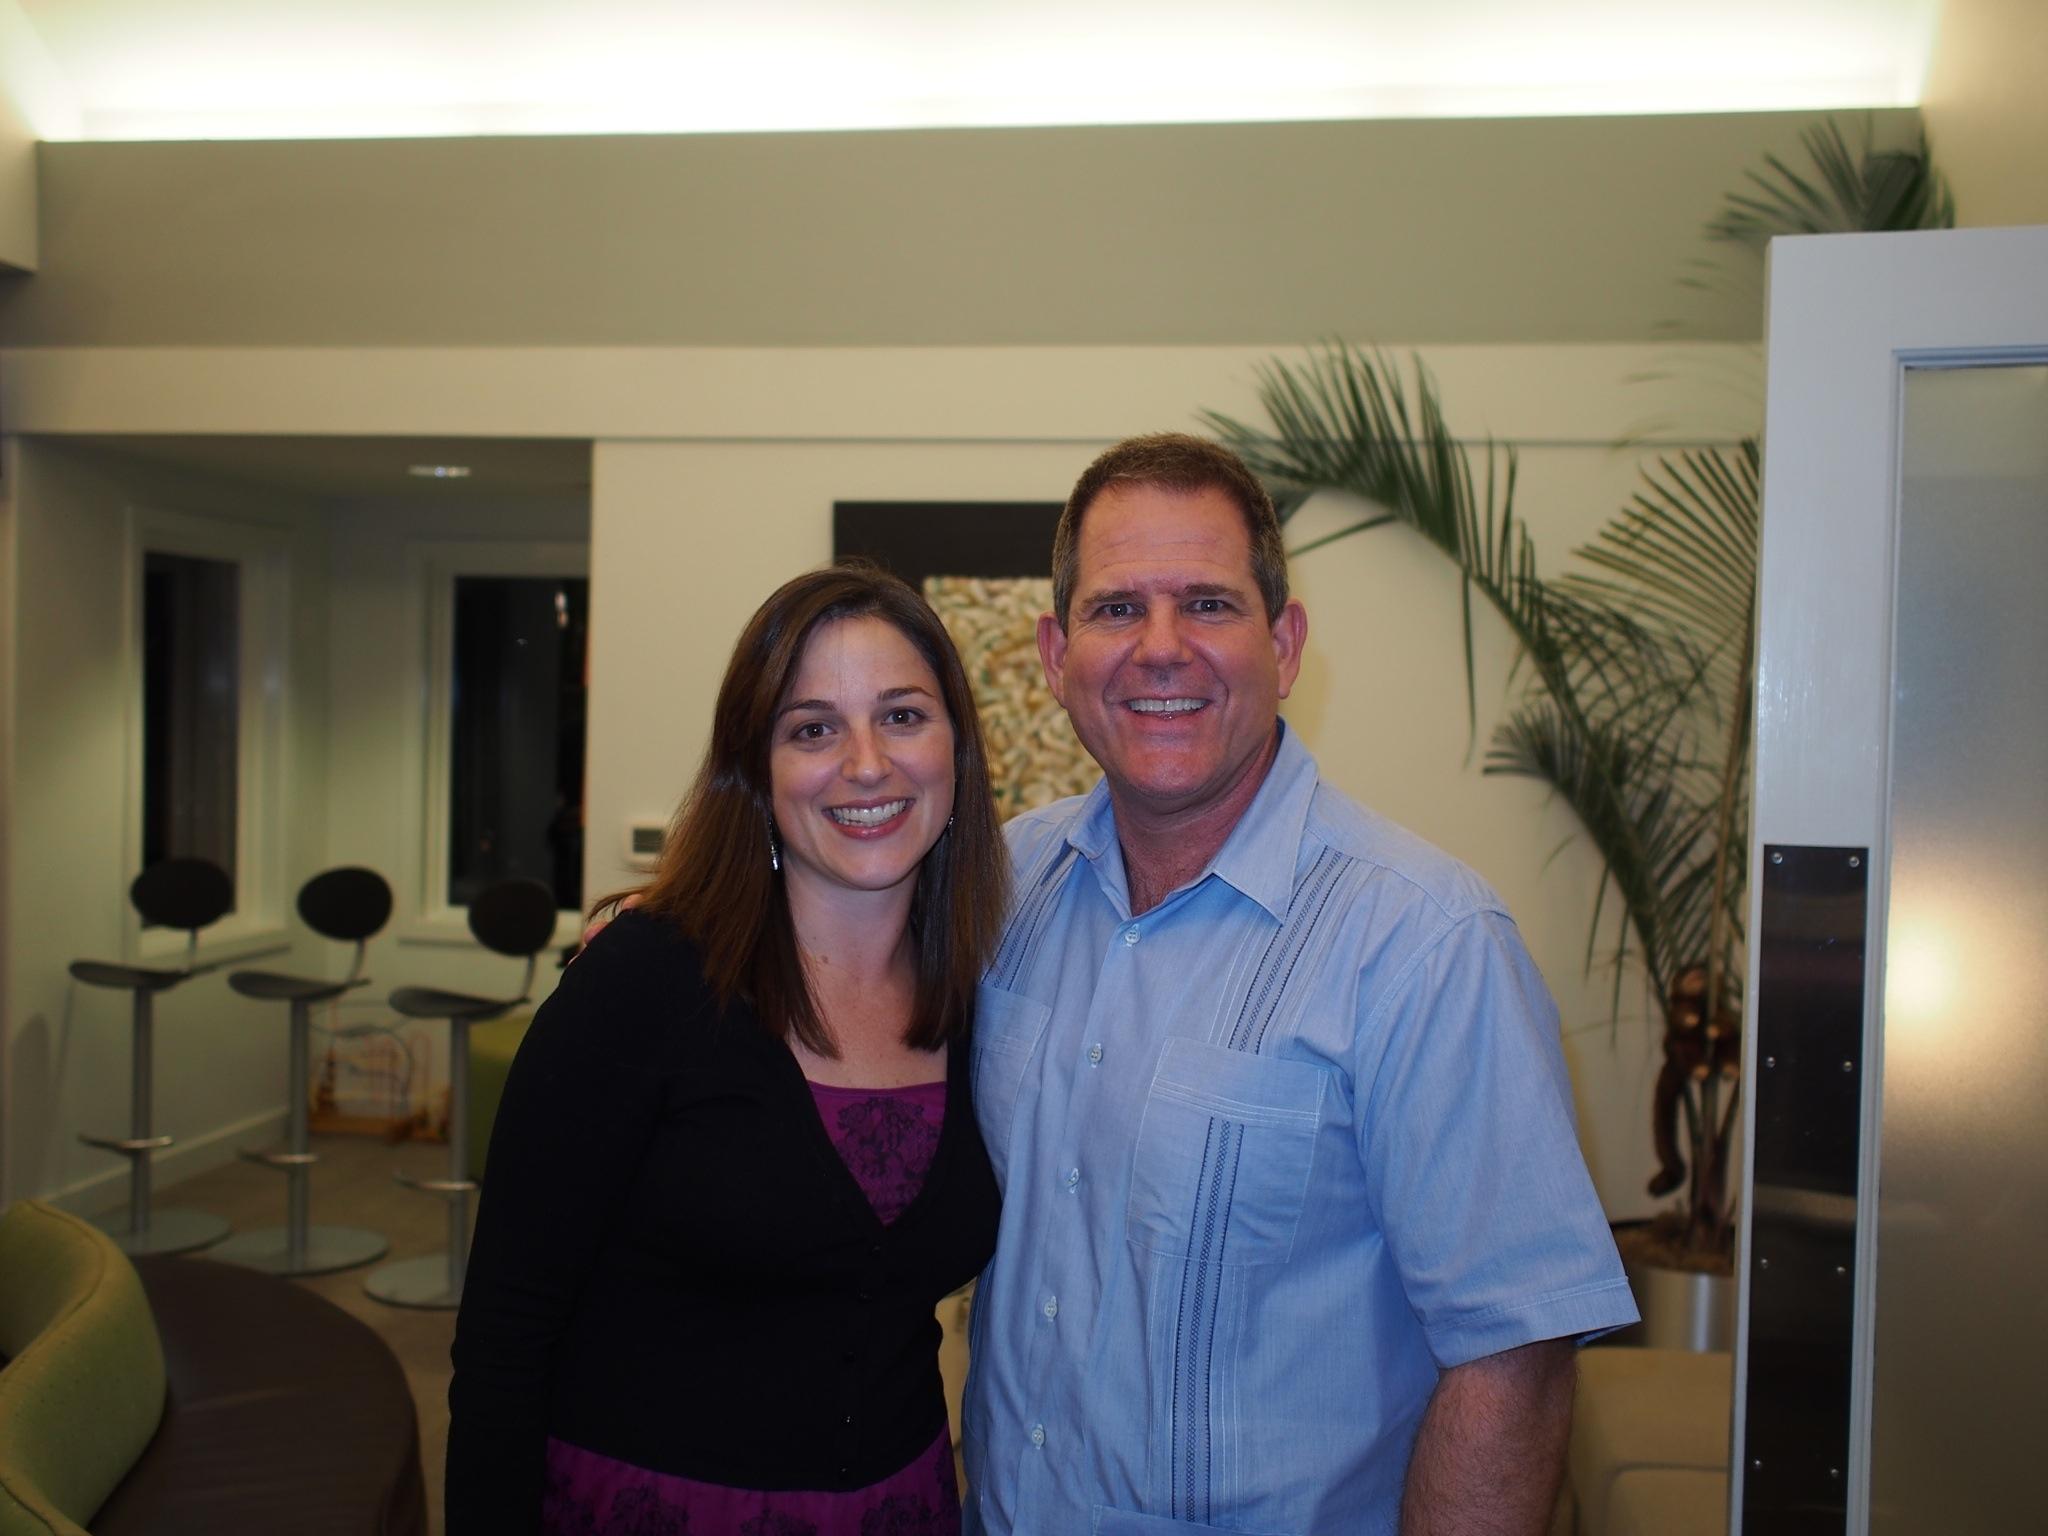 TOSC Executive Secretary Marta Masferrer and TOSC President, Dr. David Hime